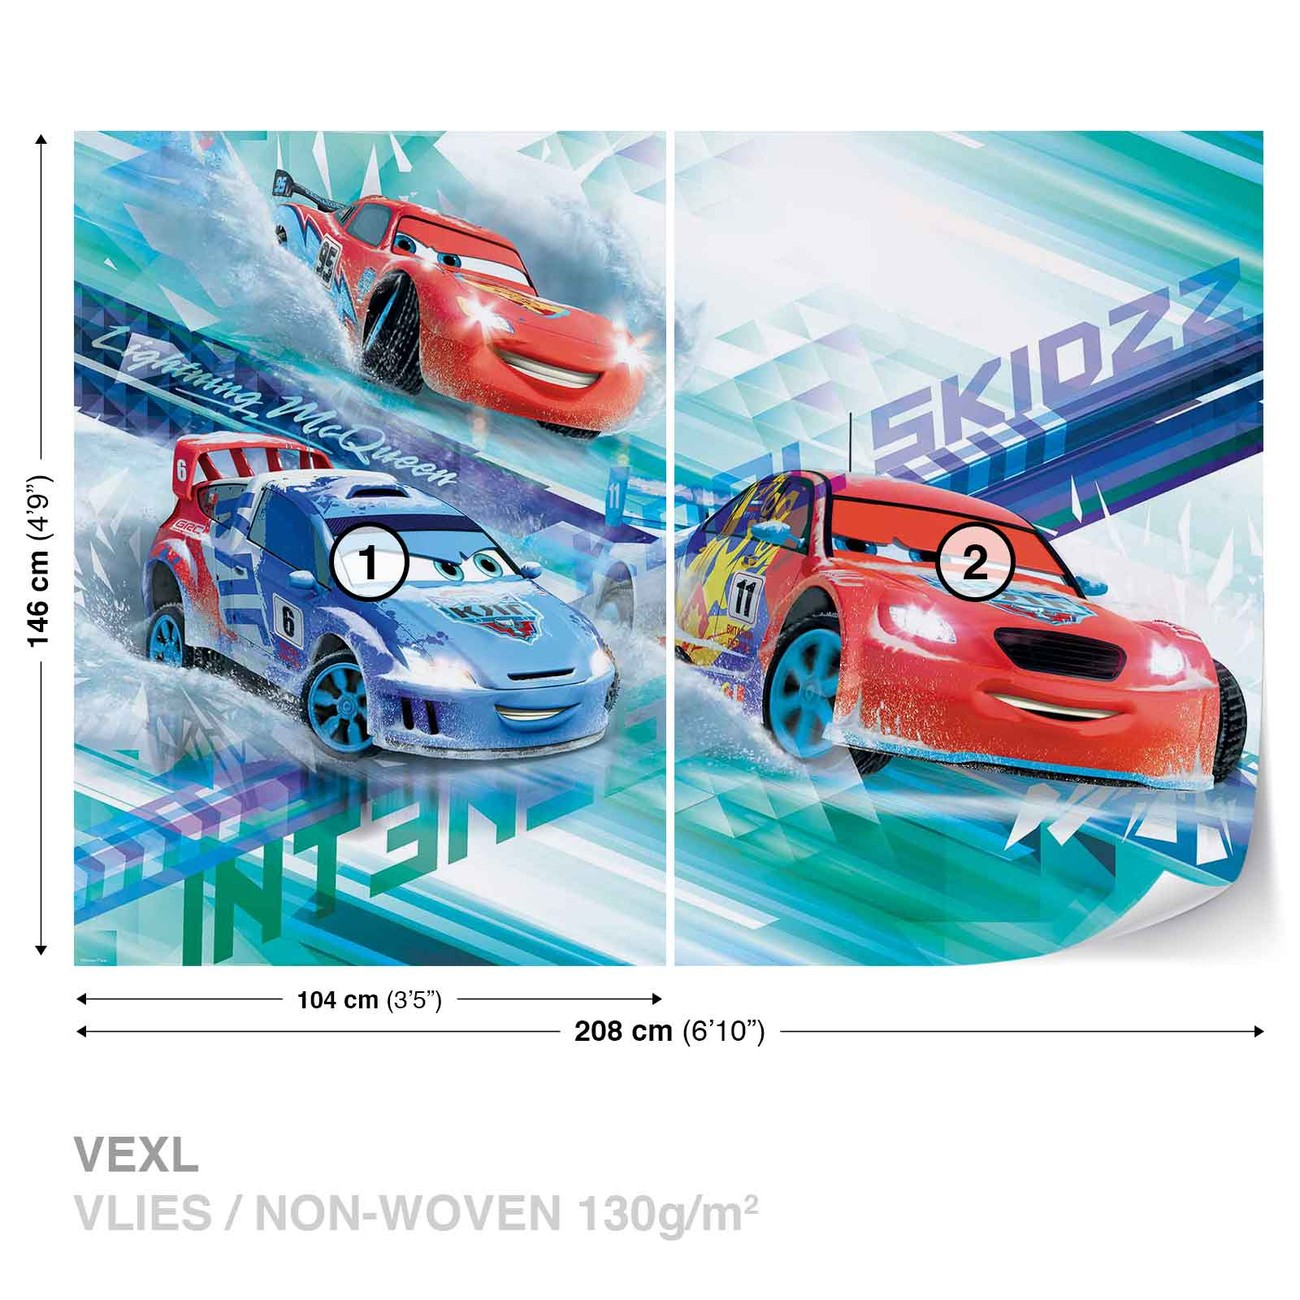 Disney cars raoul aroule mcqueen wall paper mural buy for Disney cars wall mural uk